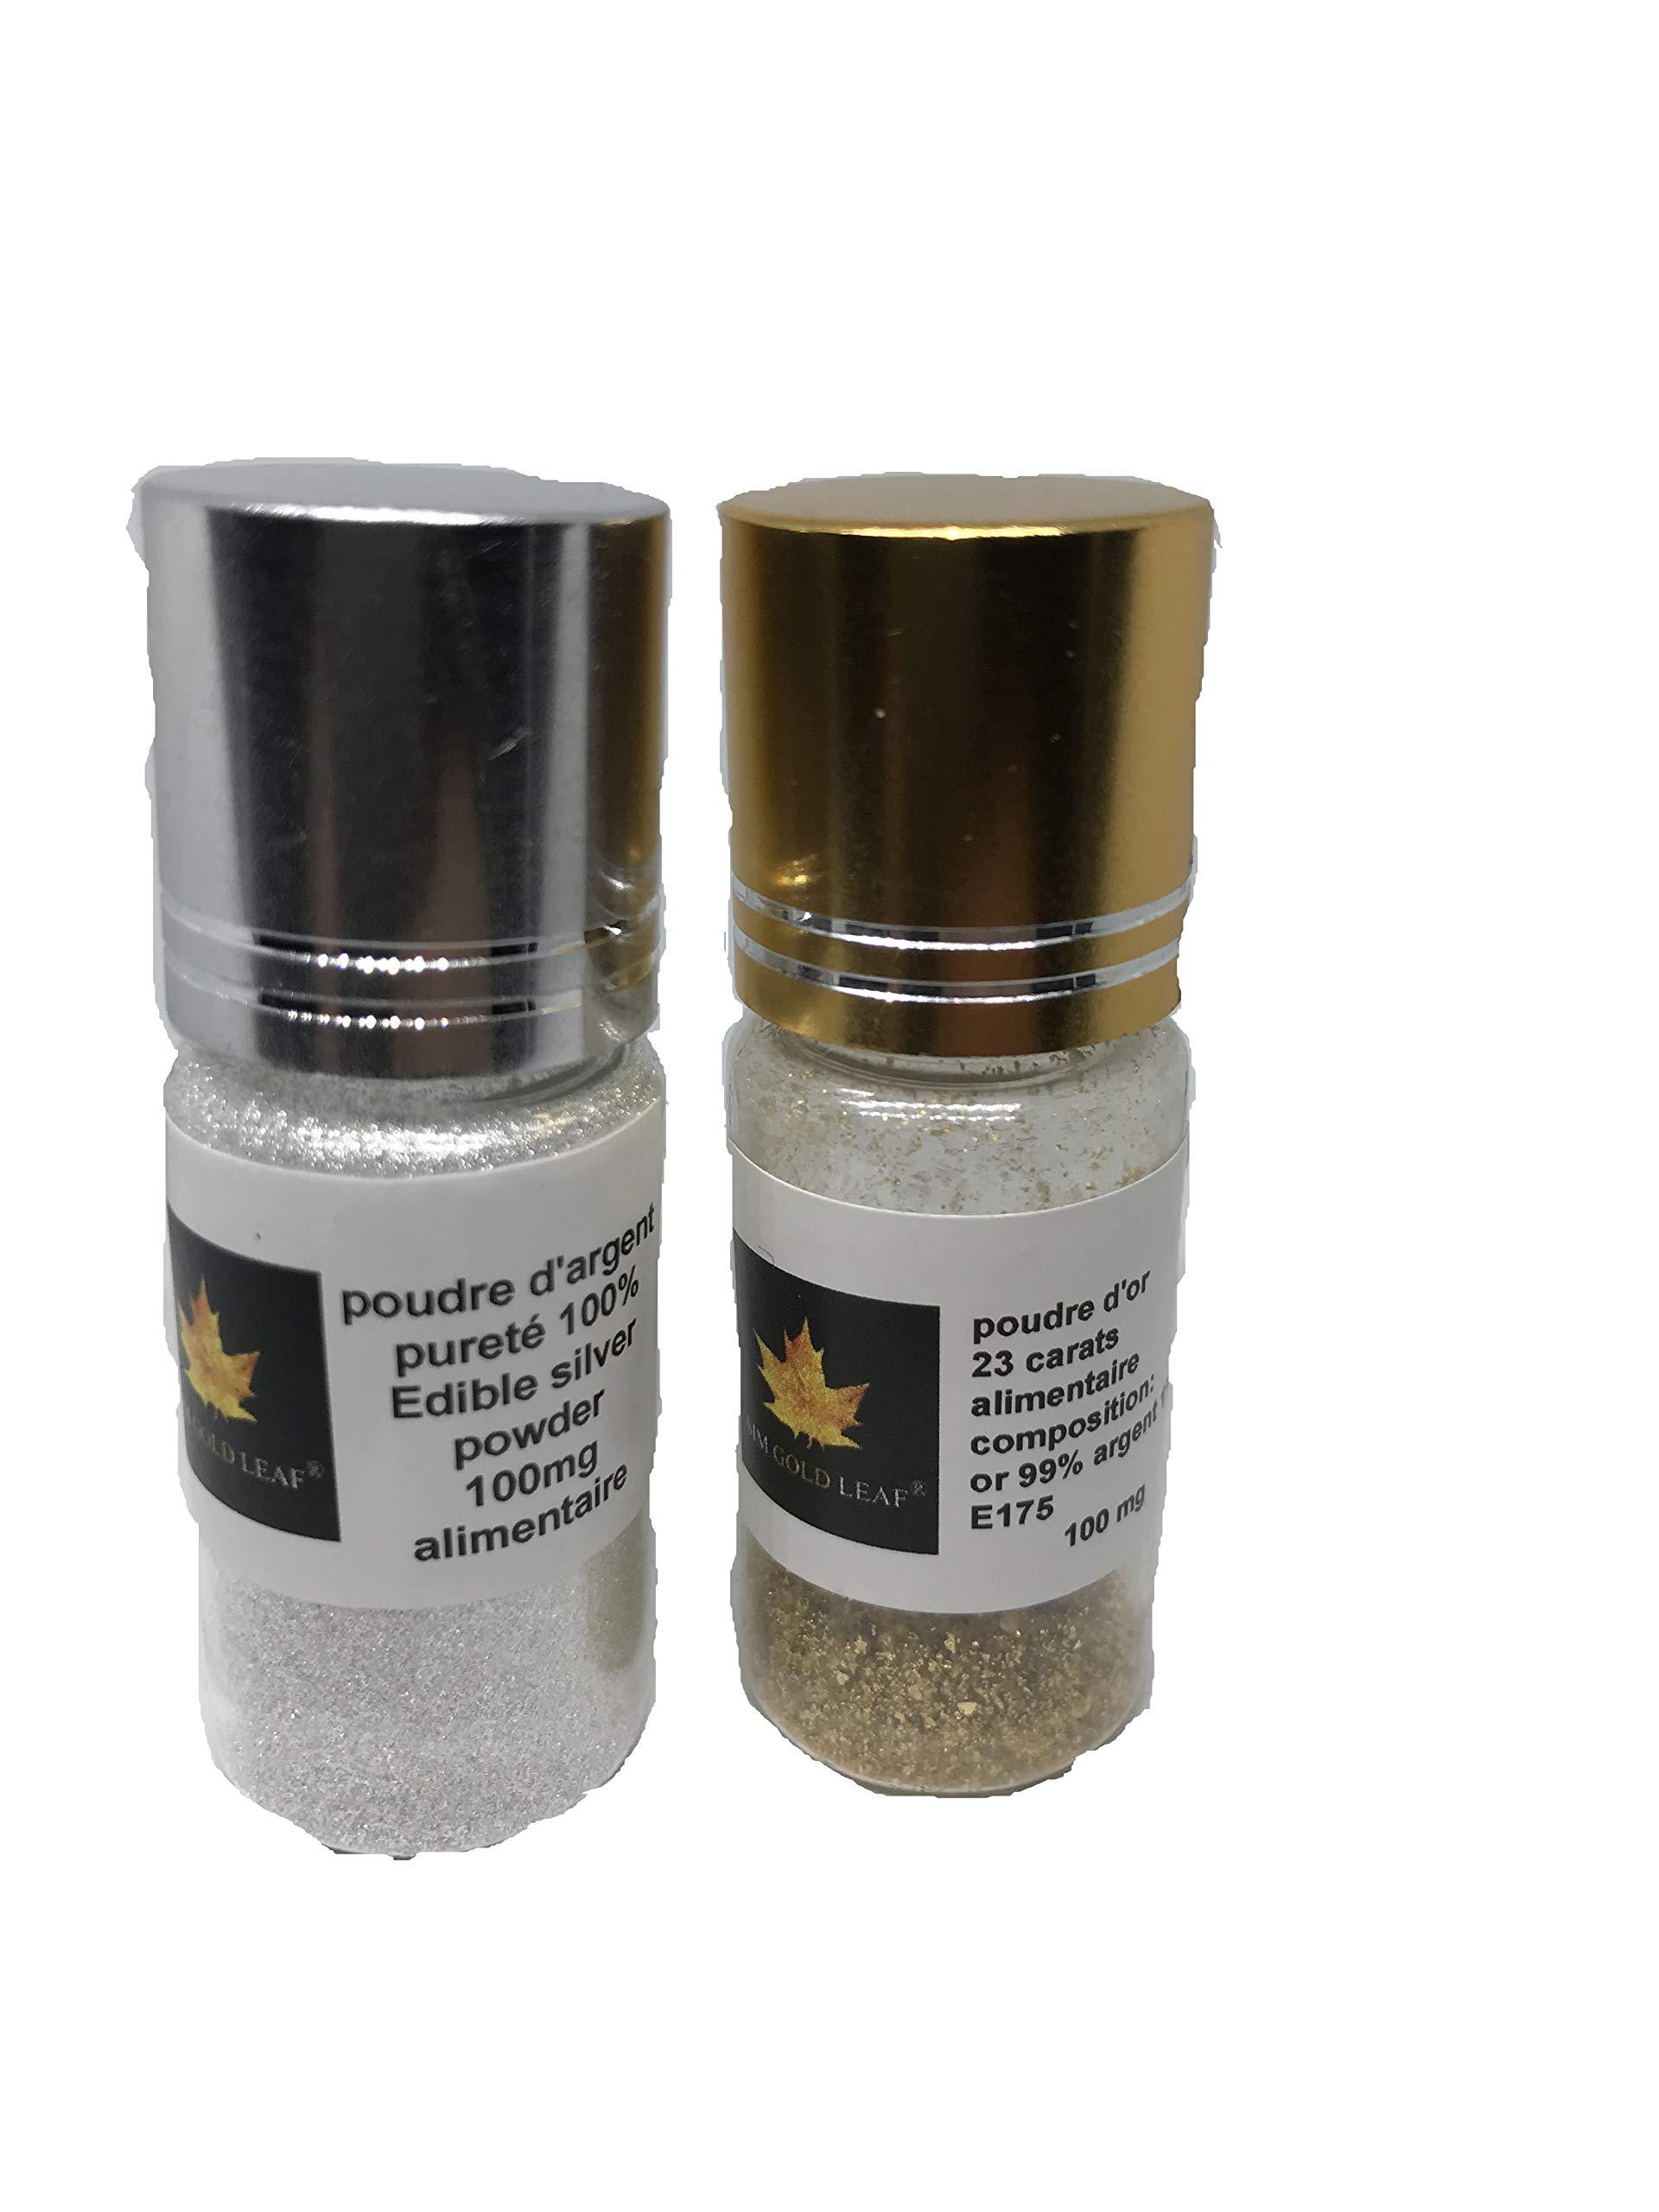 Pack of 100mg 100% Pure Edible Food Powder 100 mg 23 Carat Gold and Silver